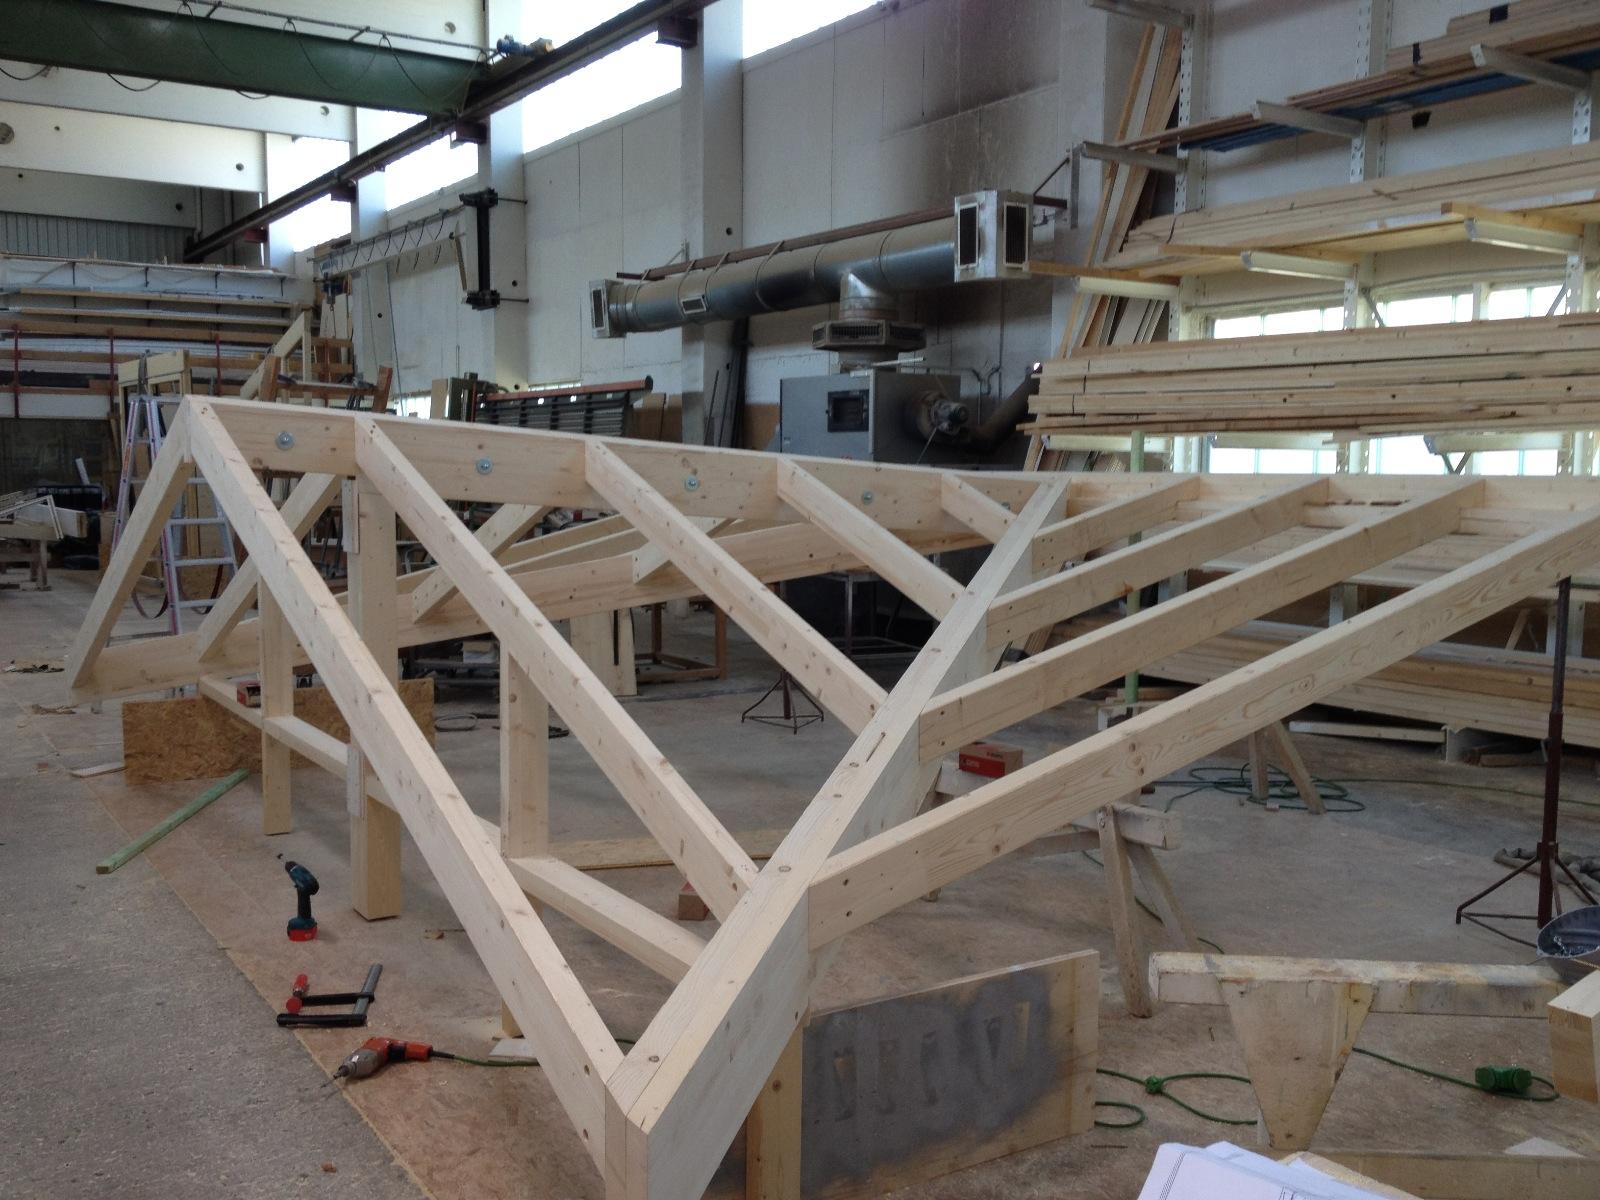 Préfabrication de la véranda par l'entreprise Willmann GmbH